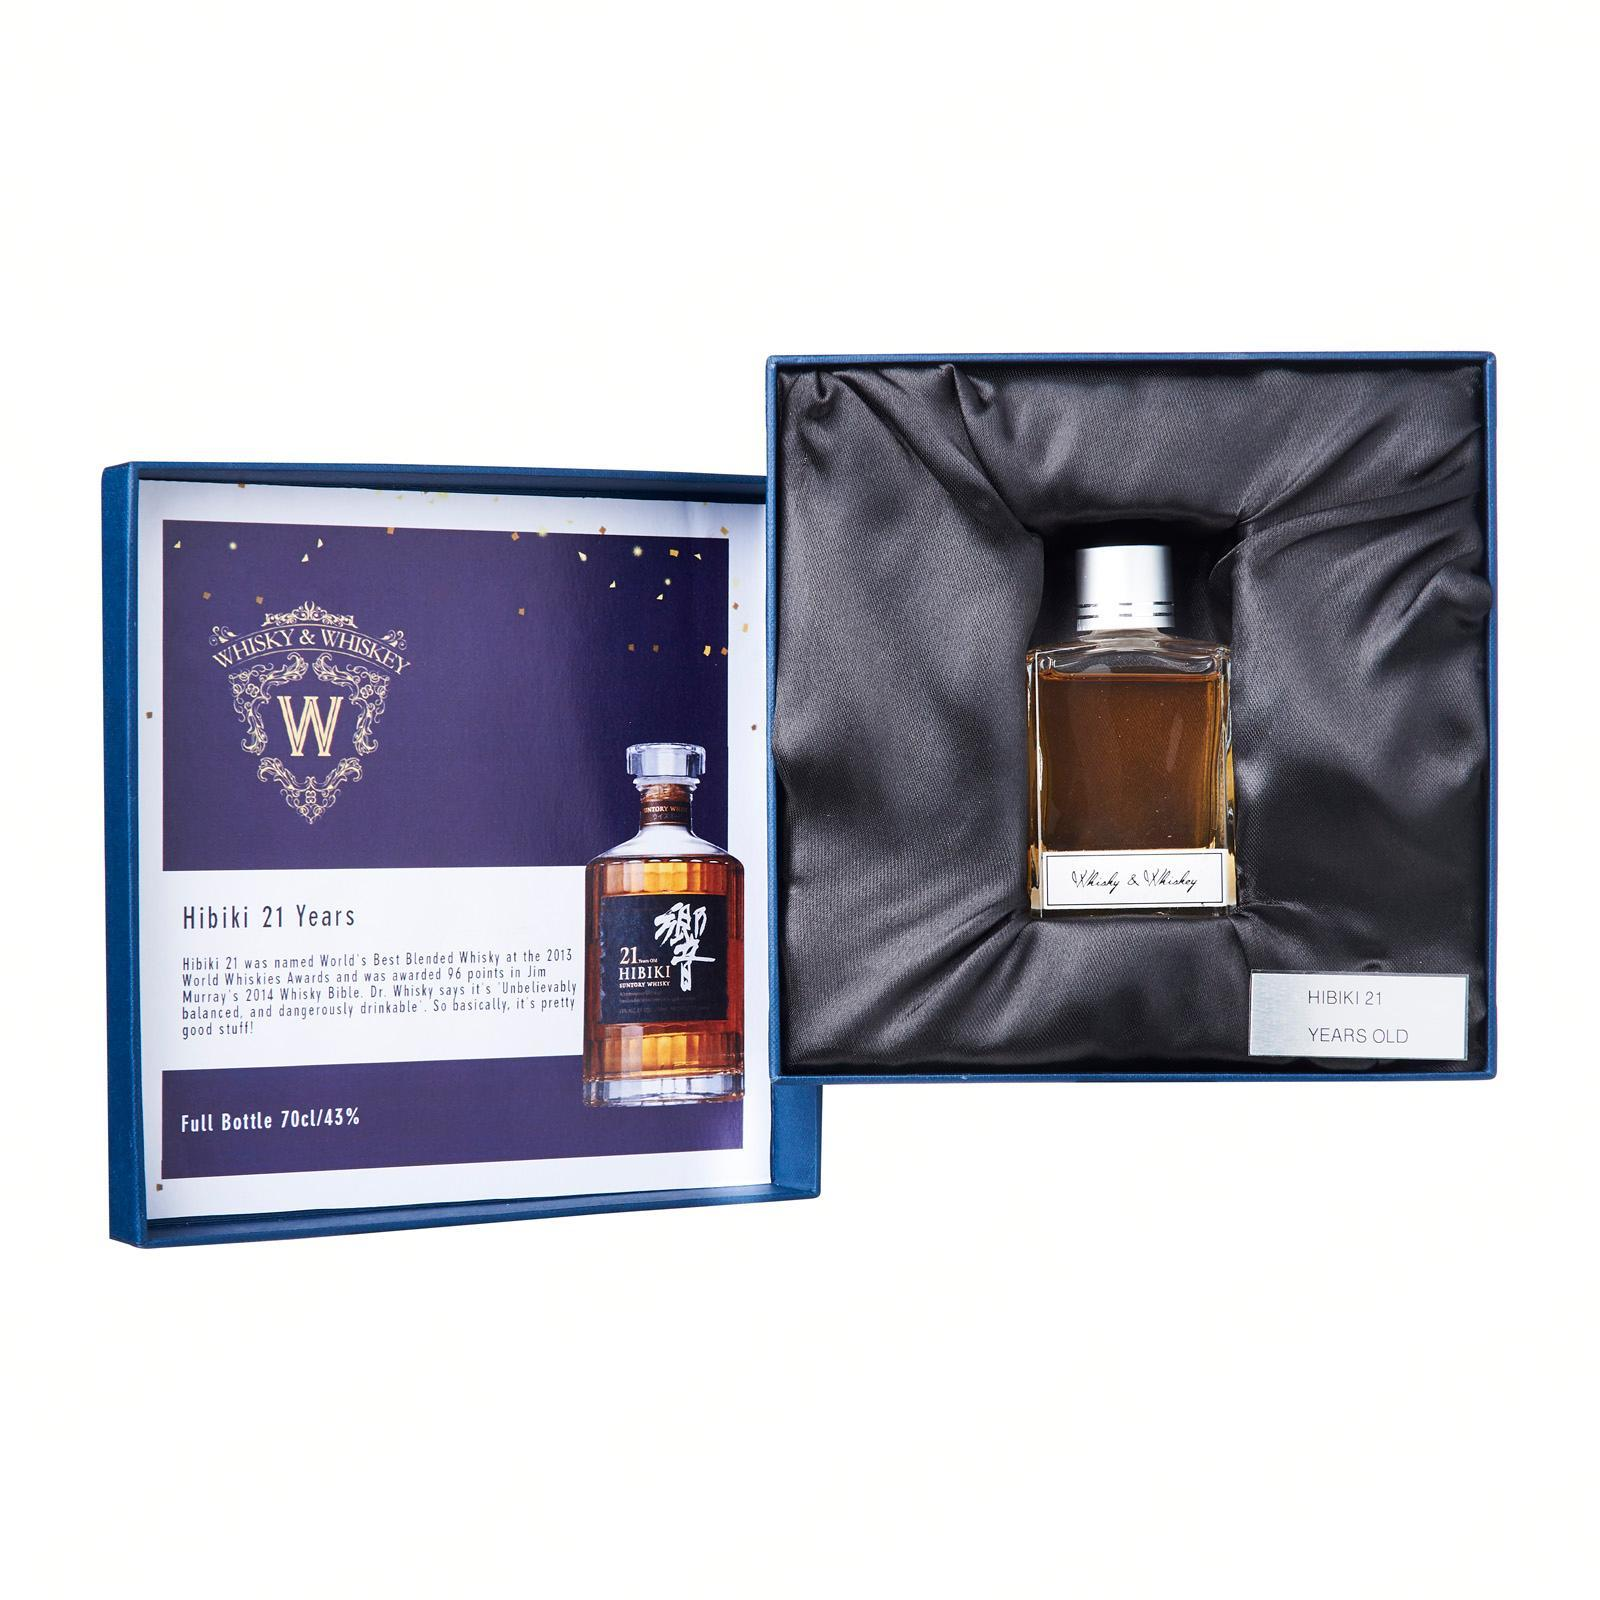 Hibiki Dram Set For Hibiki 21 Years Whisky - By The Liquor Shop Singapore